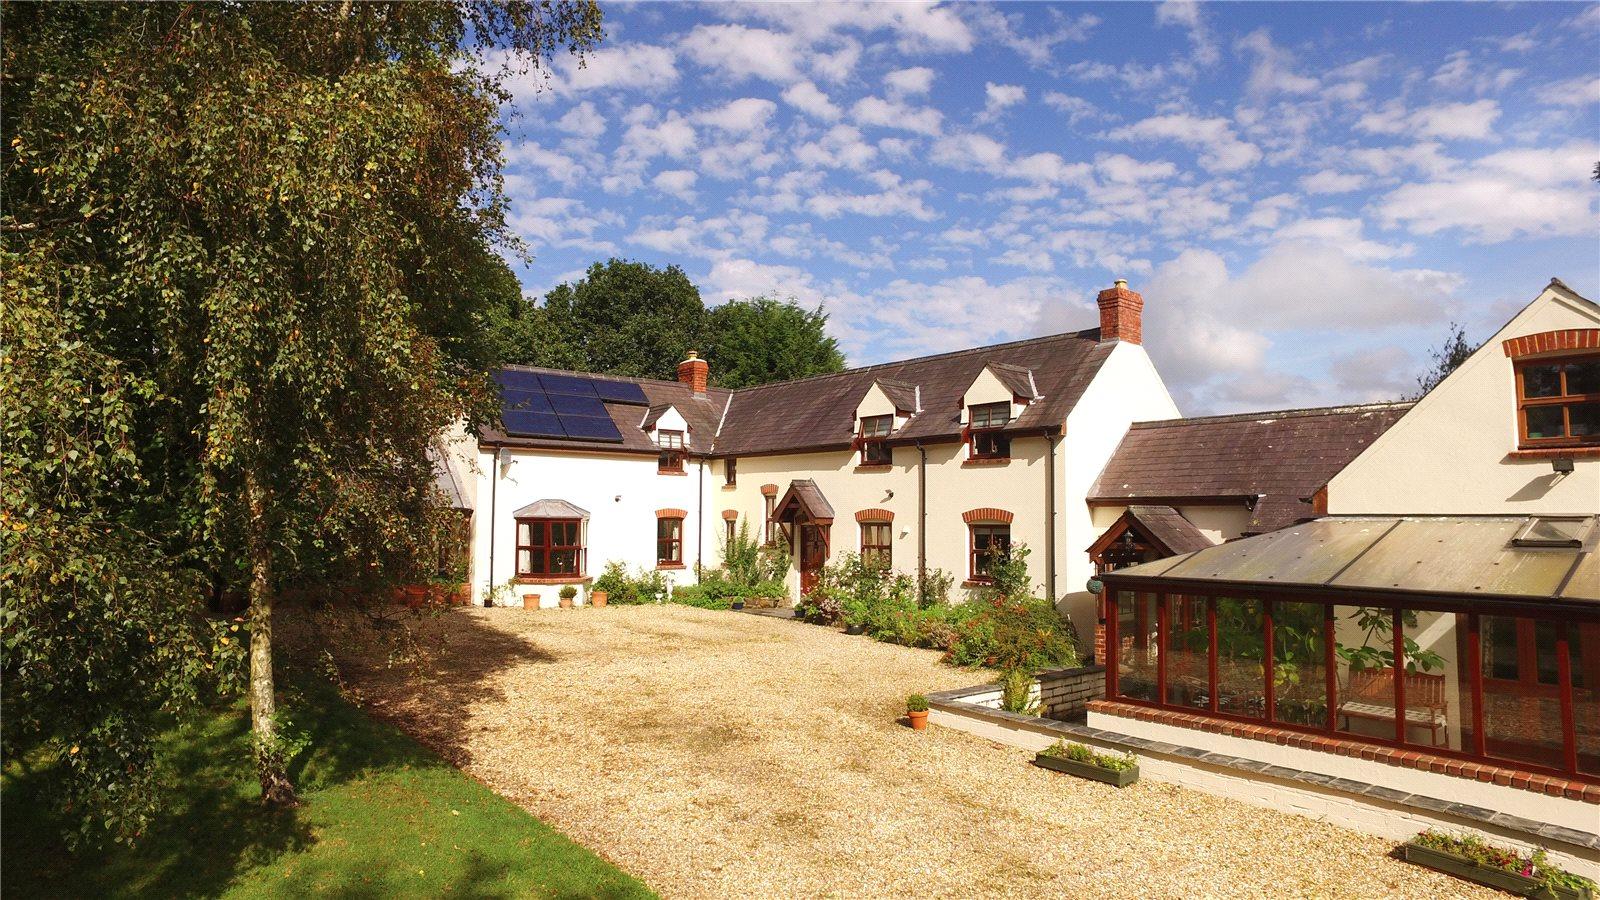 7 Bedrooms Detached House for sale in Brynsiriol, Llechryd, Cardigan, Ceredigion